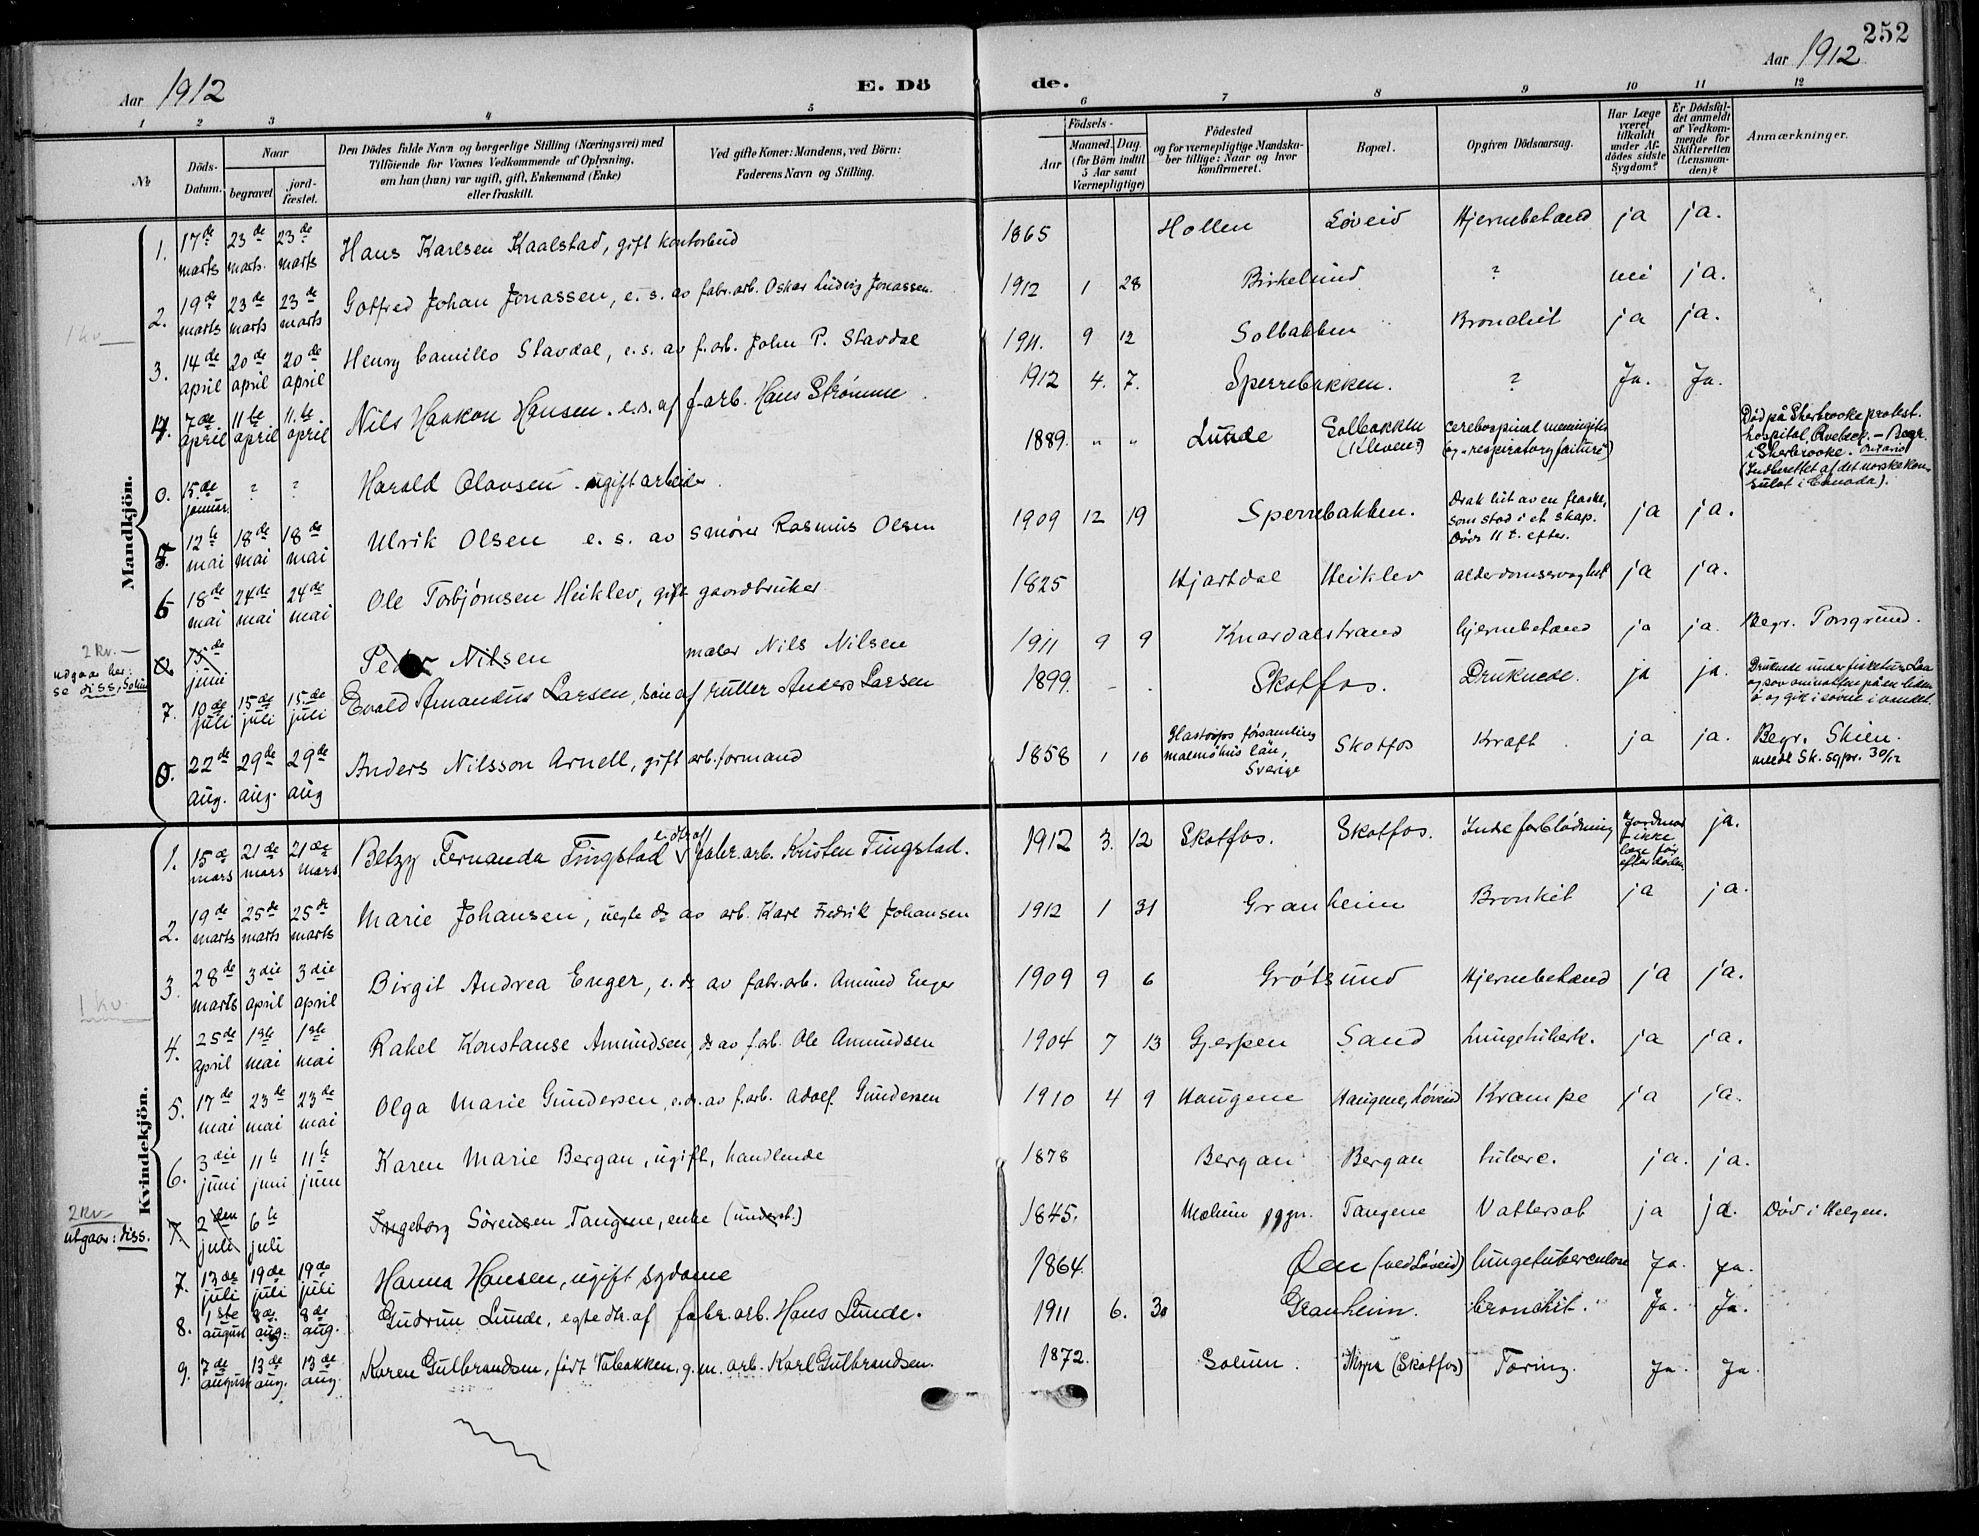 SAKO, Solum kirkebøker, F/Fb/L0003: Ministerialbok nr. II 3, 1901-1912, s. 252